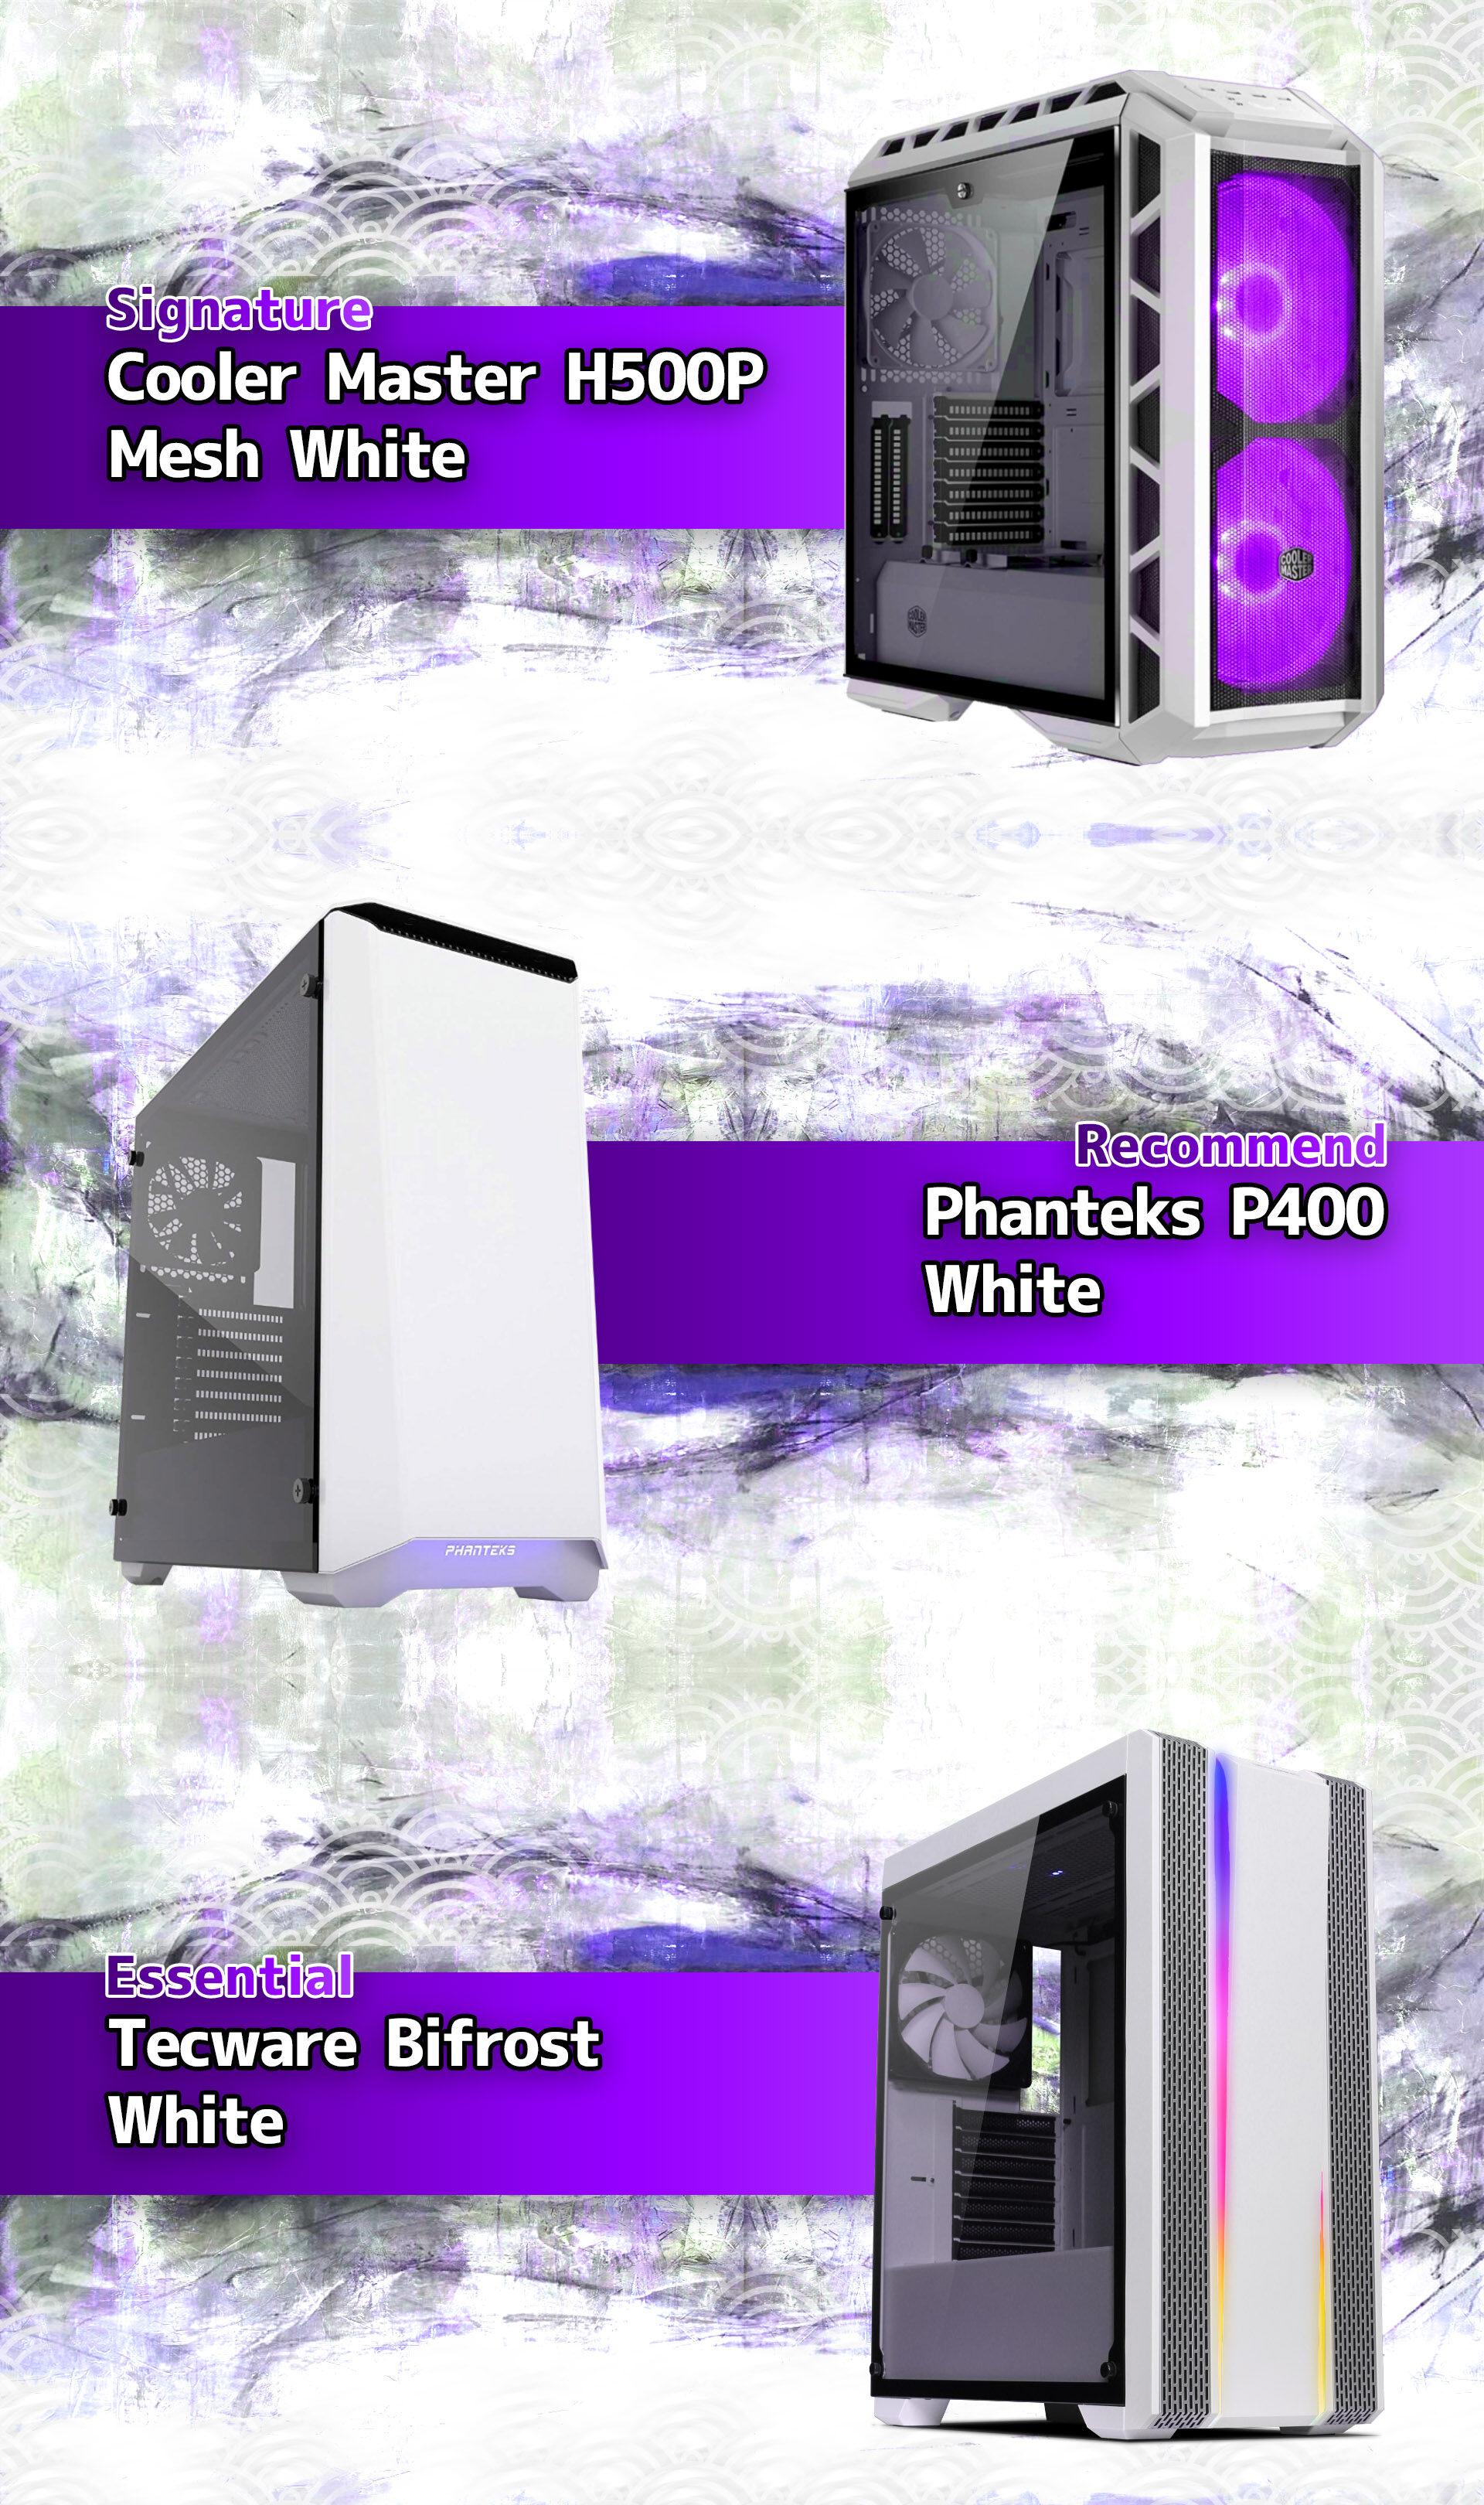 [Gaming PC][AMAKUSA Oja Lv 2B] AMD Ryzen 9 3900X Wraith Prism Gigabyte X570  Aorus Master HyperX Predator RGB 16GB 3200MHz Galax RTX 2080 Super XPG